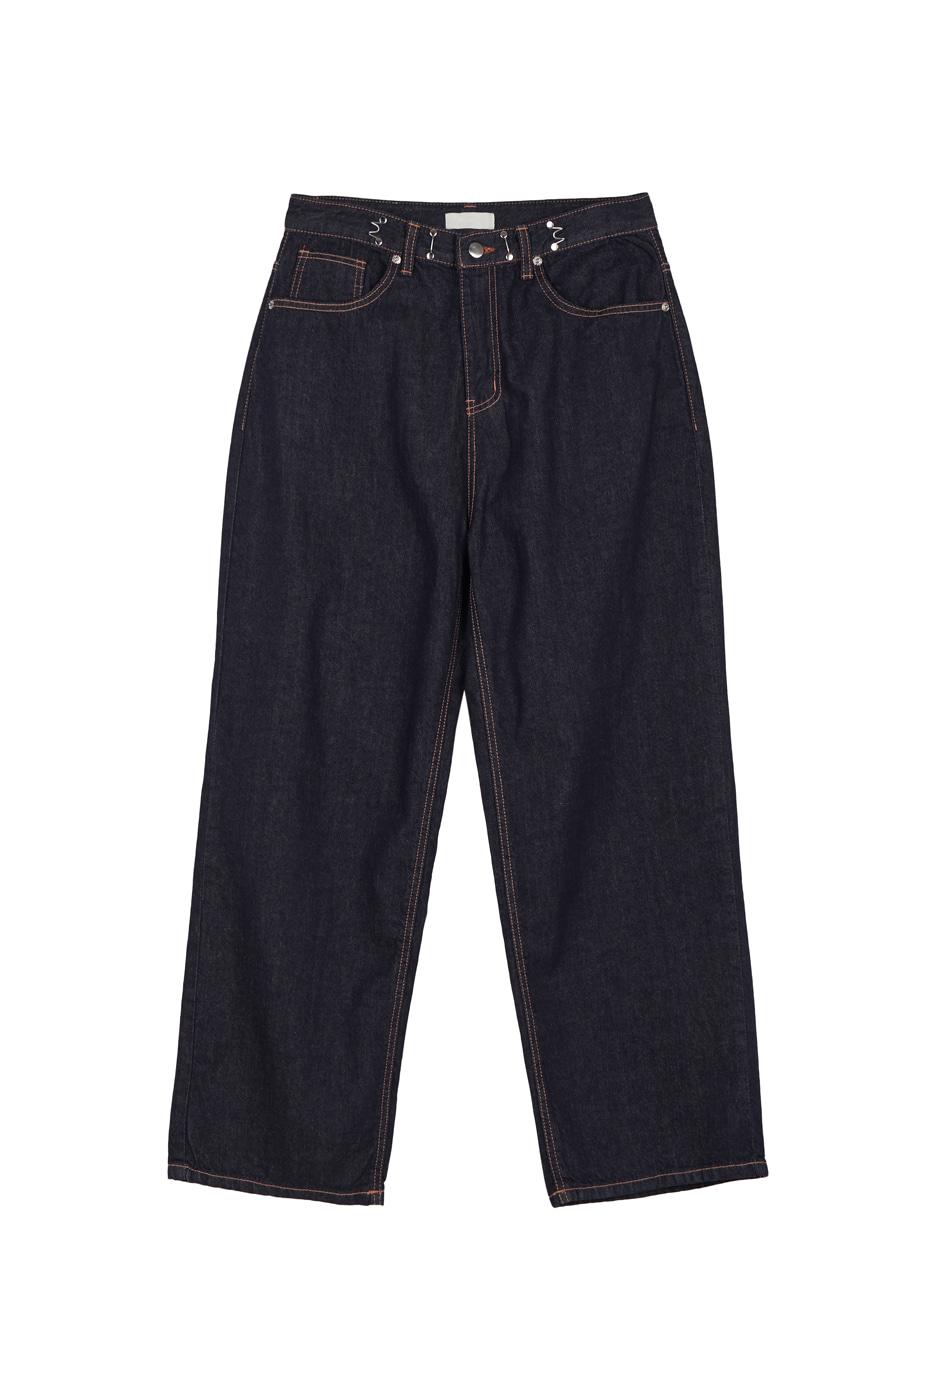 Hook Raw wide jeans